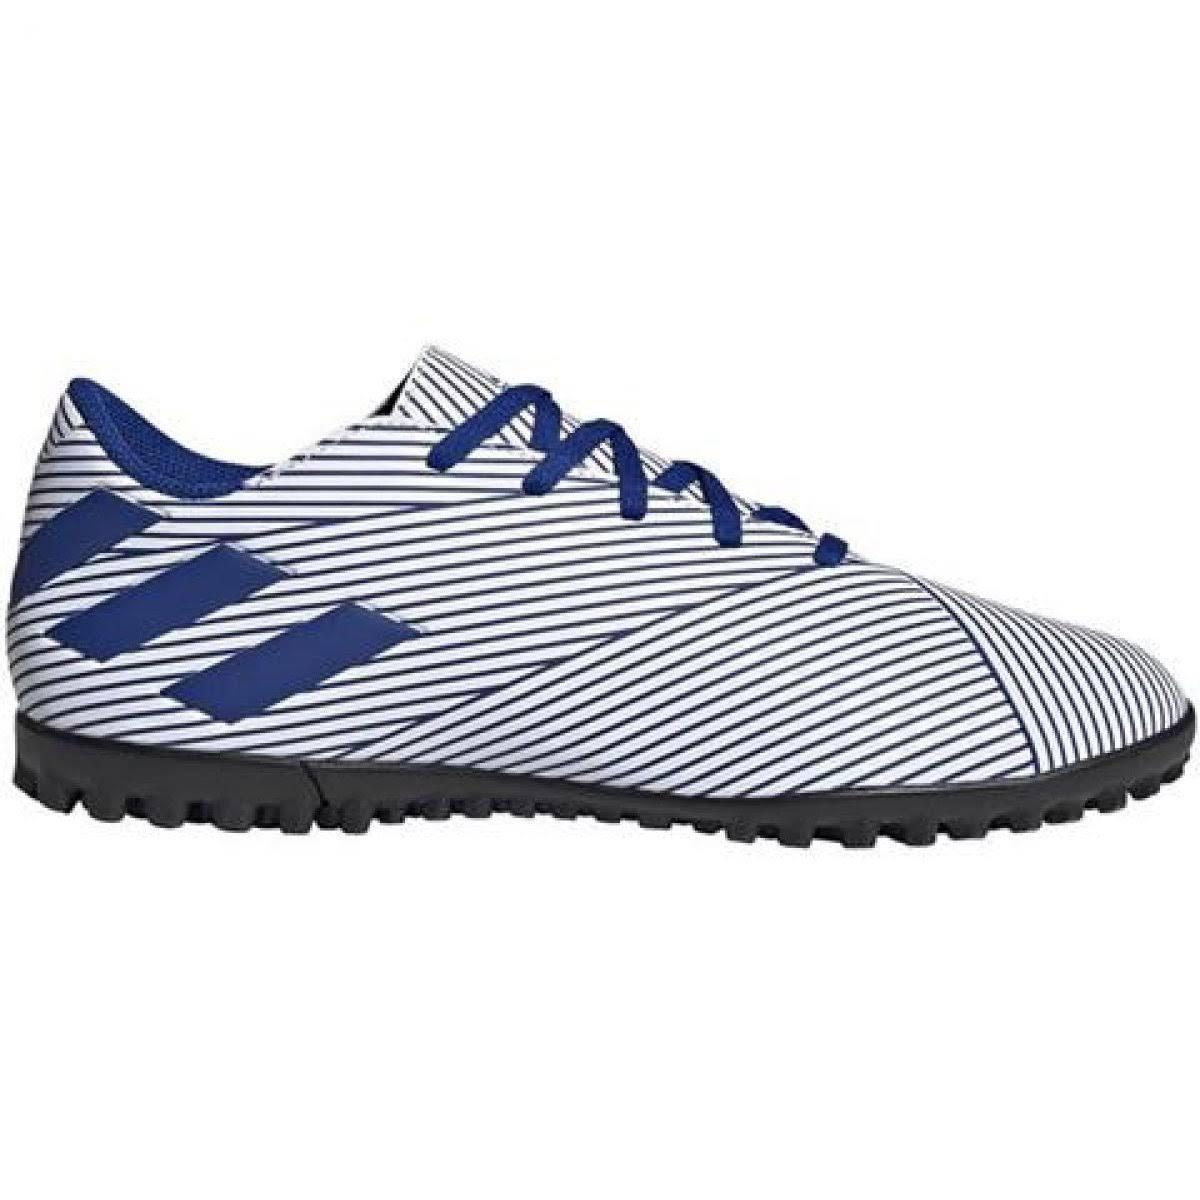 Adidas Nemeziz 19.4 TF White Royal Blue Core Black